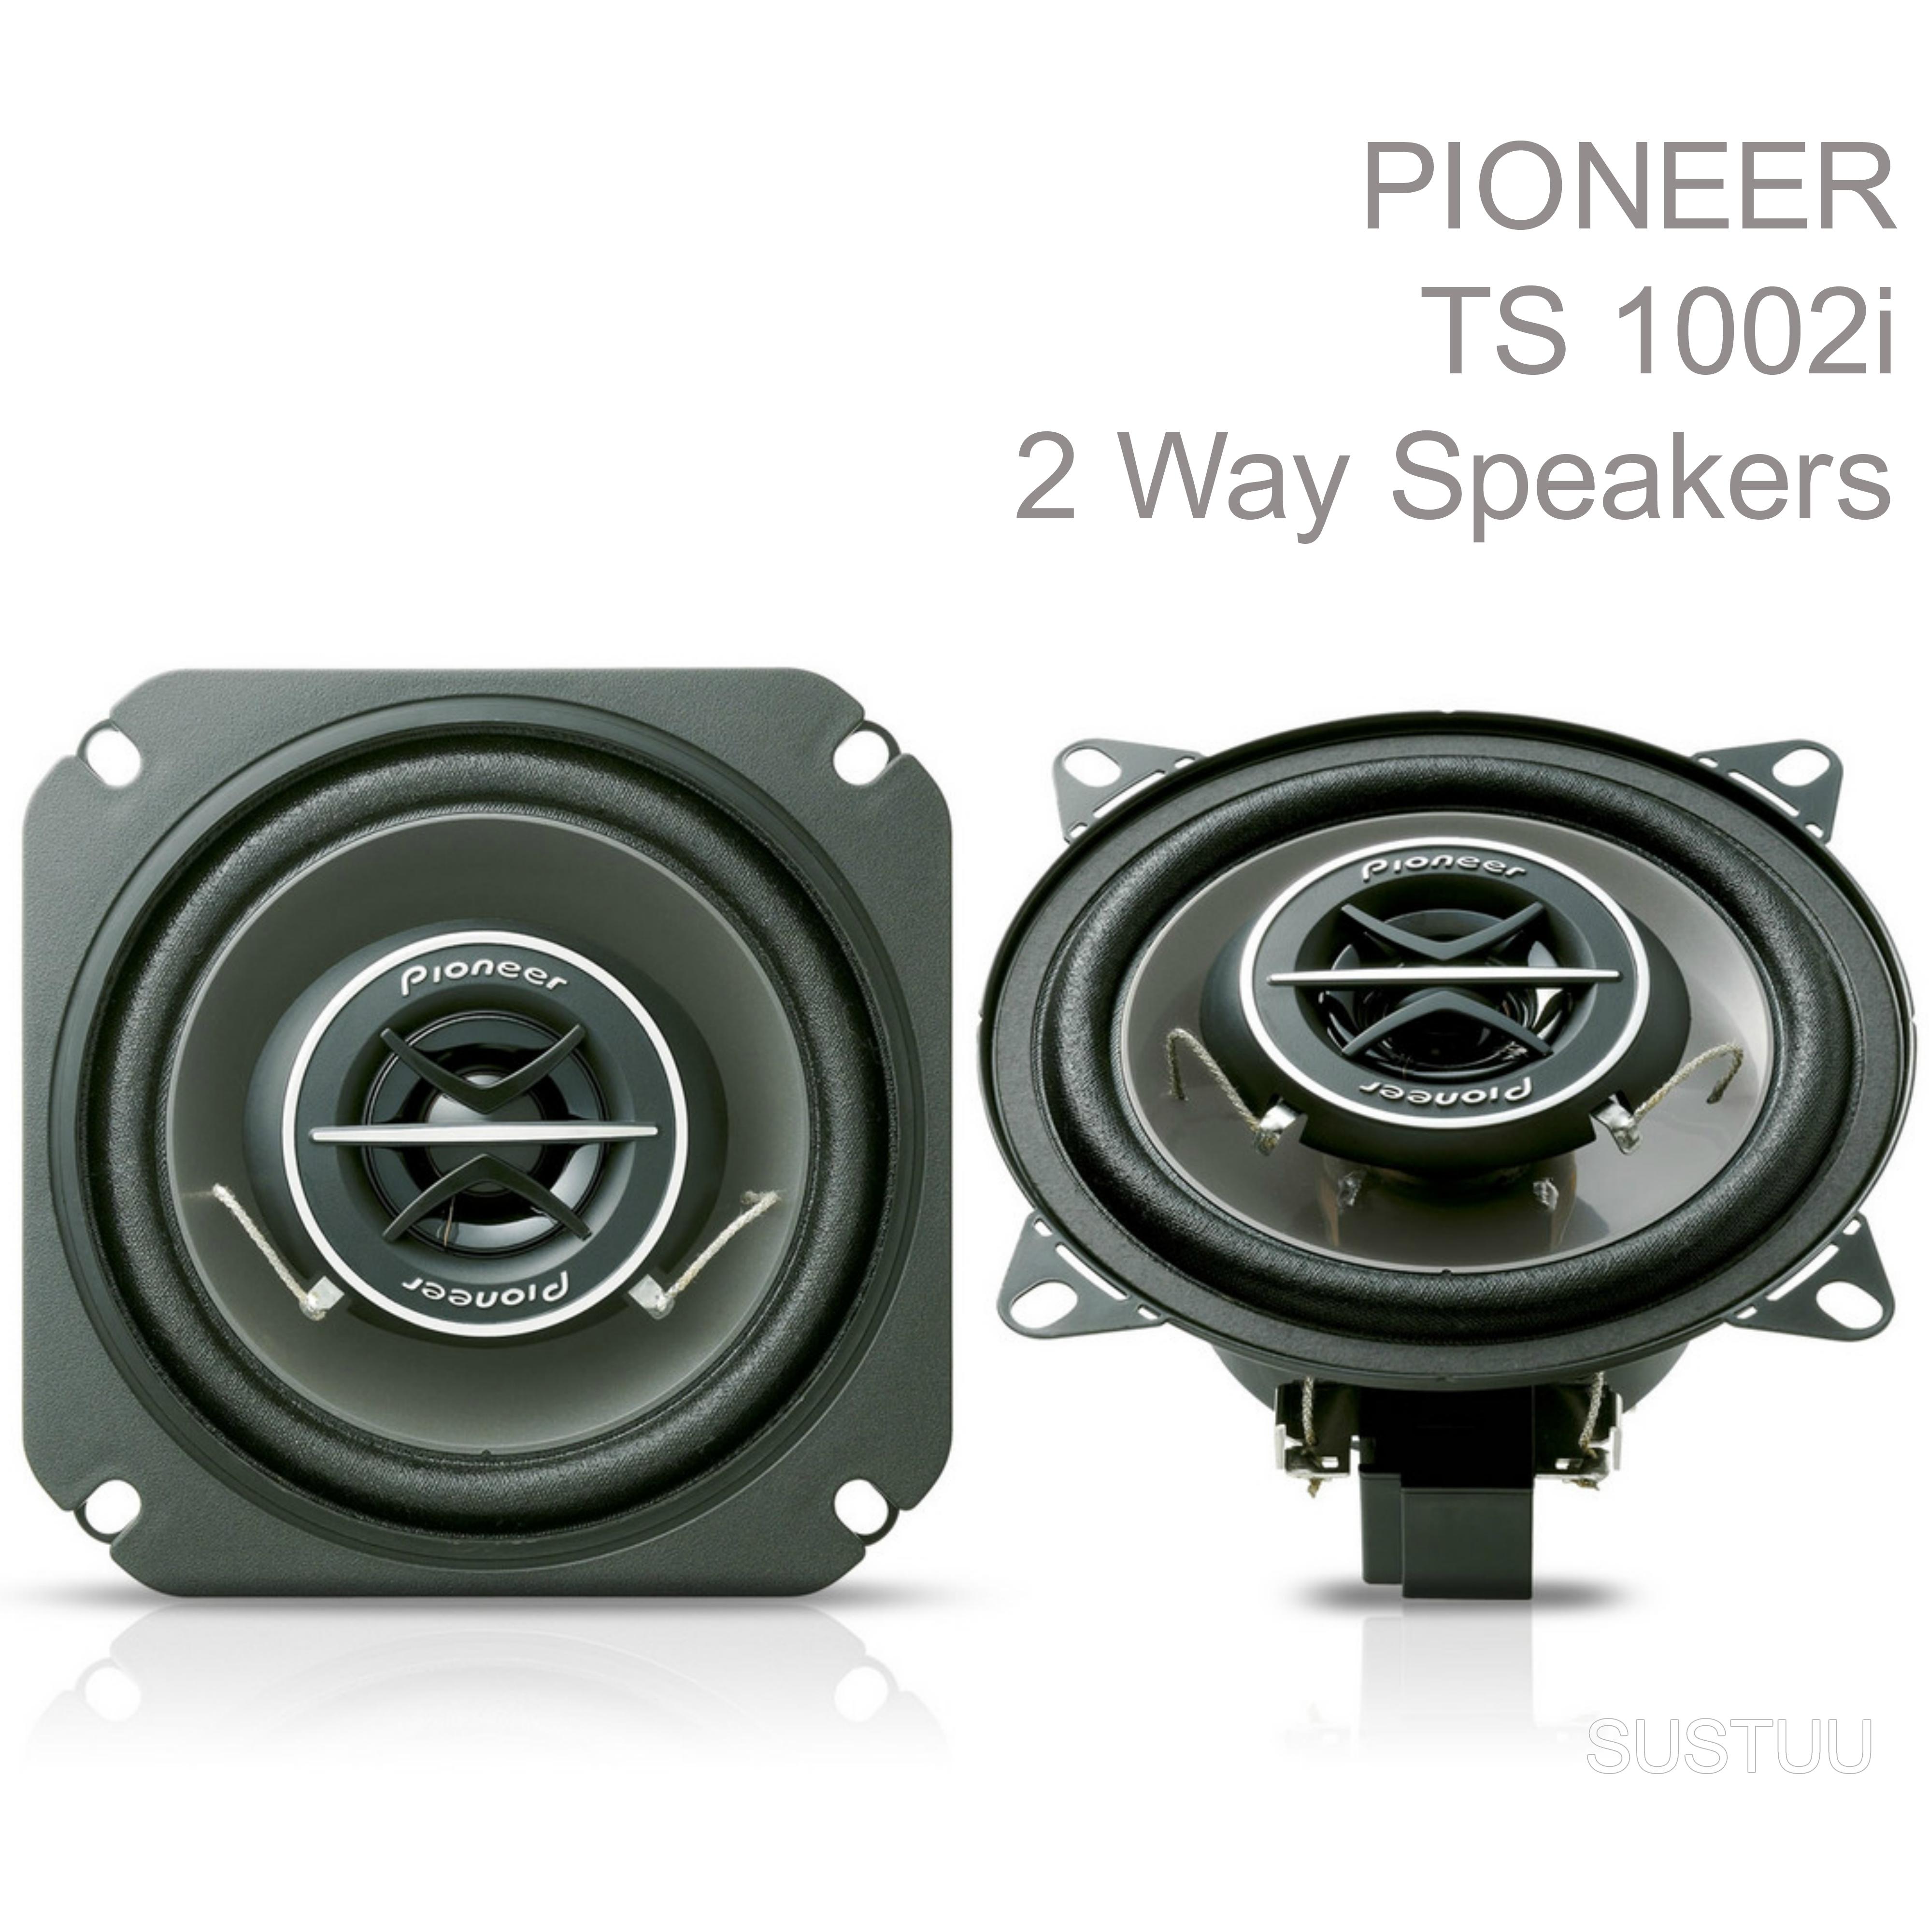 PIONEER TS 1002i 10cm 2 Way 120W In Car Vehicle Audio Sound Speaker